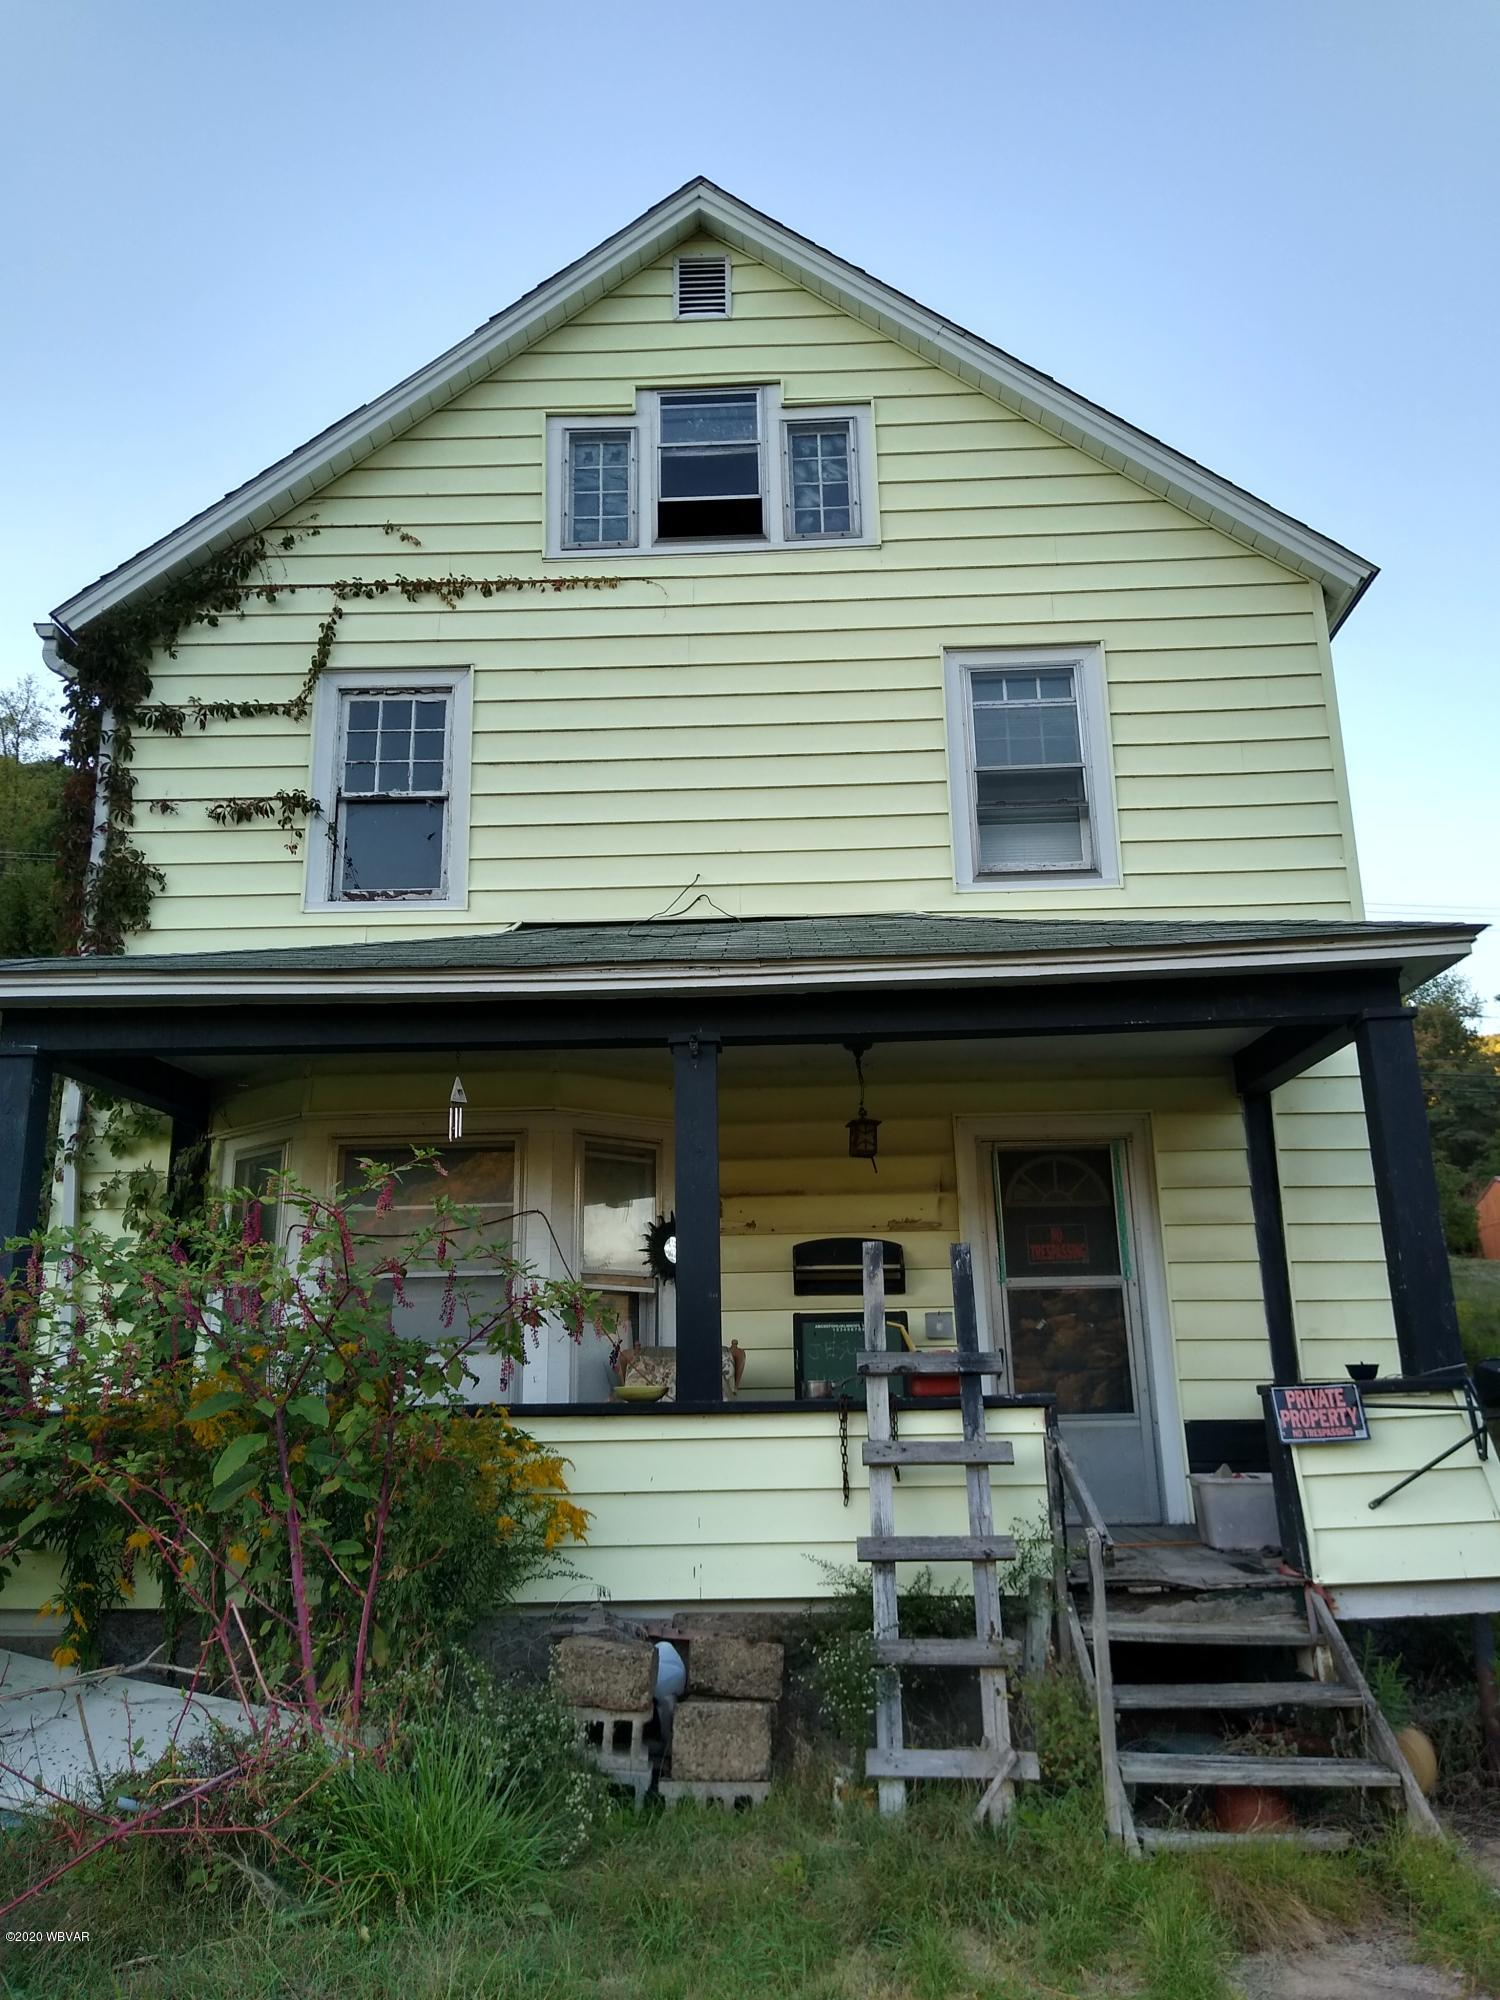 2034 DELAWARE AVENUE, Renovo, PA 17764, 4 Bedrooms Bedrooms, ,1 BathroomBathrooms,Residential,For sale,DELAWARE,WB-91343